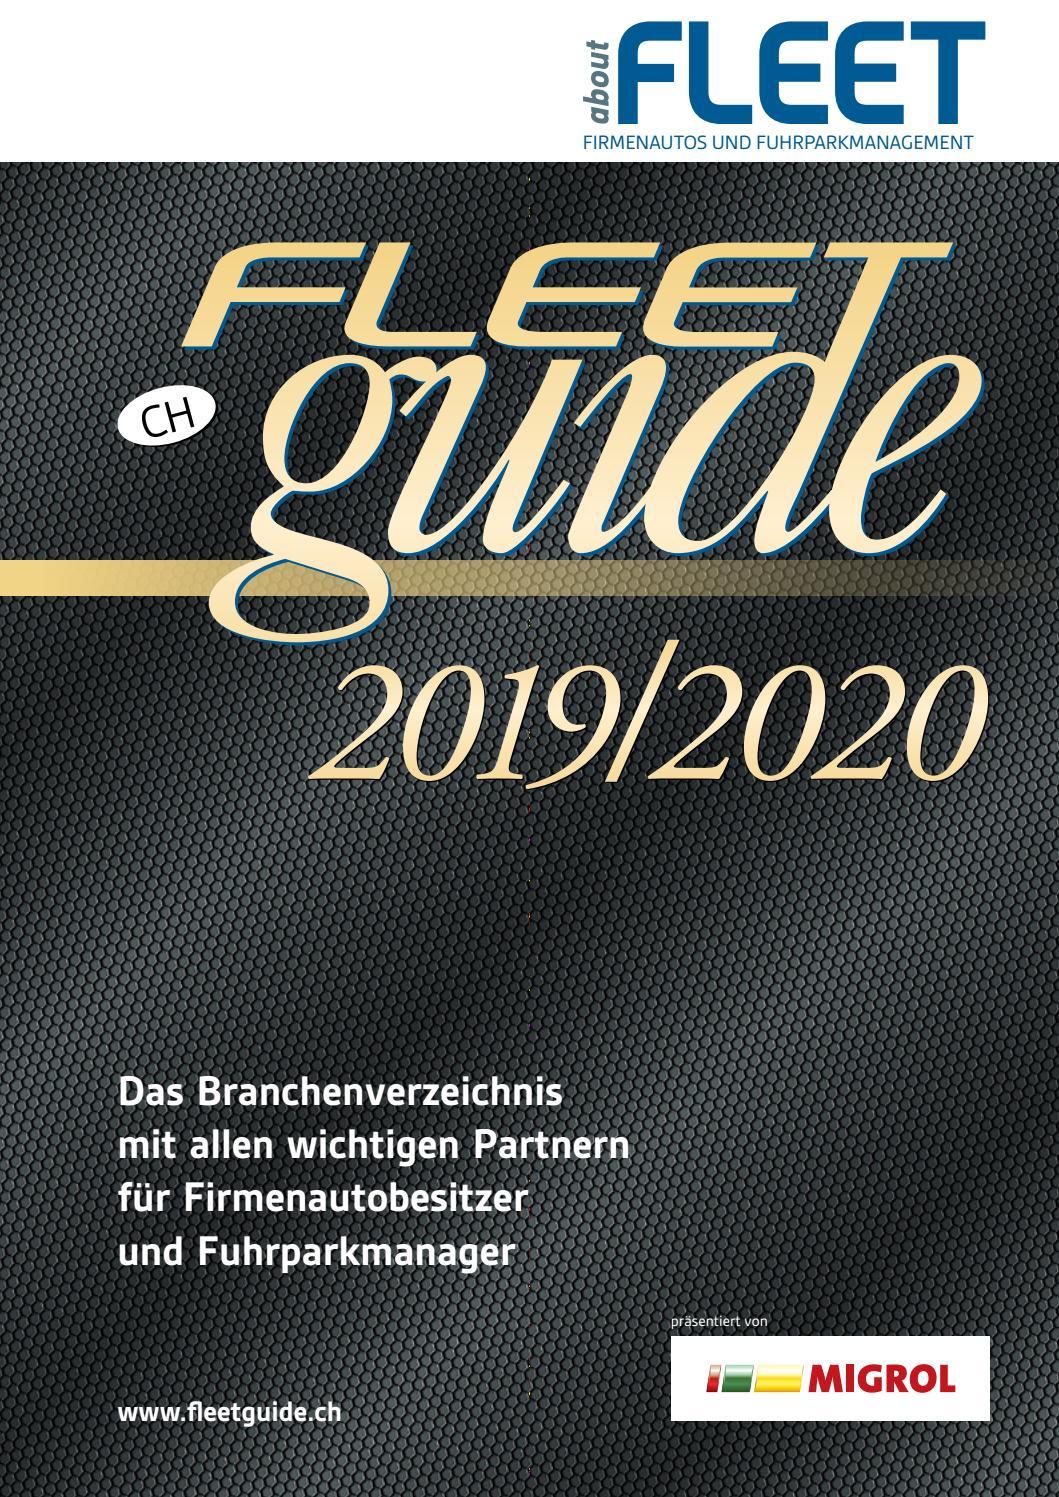 Fleet Guide 2019 By Miki Stankovic Issuu